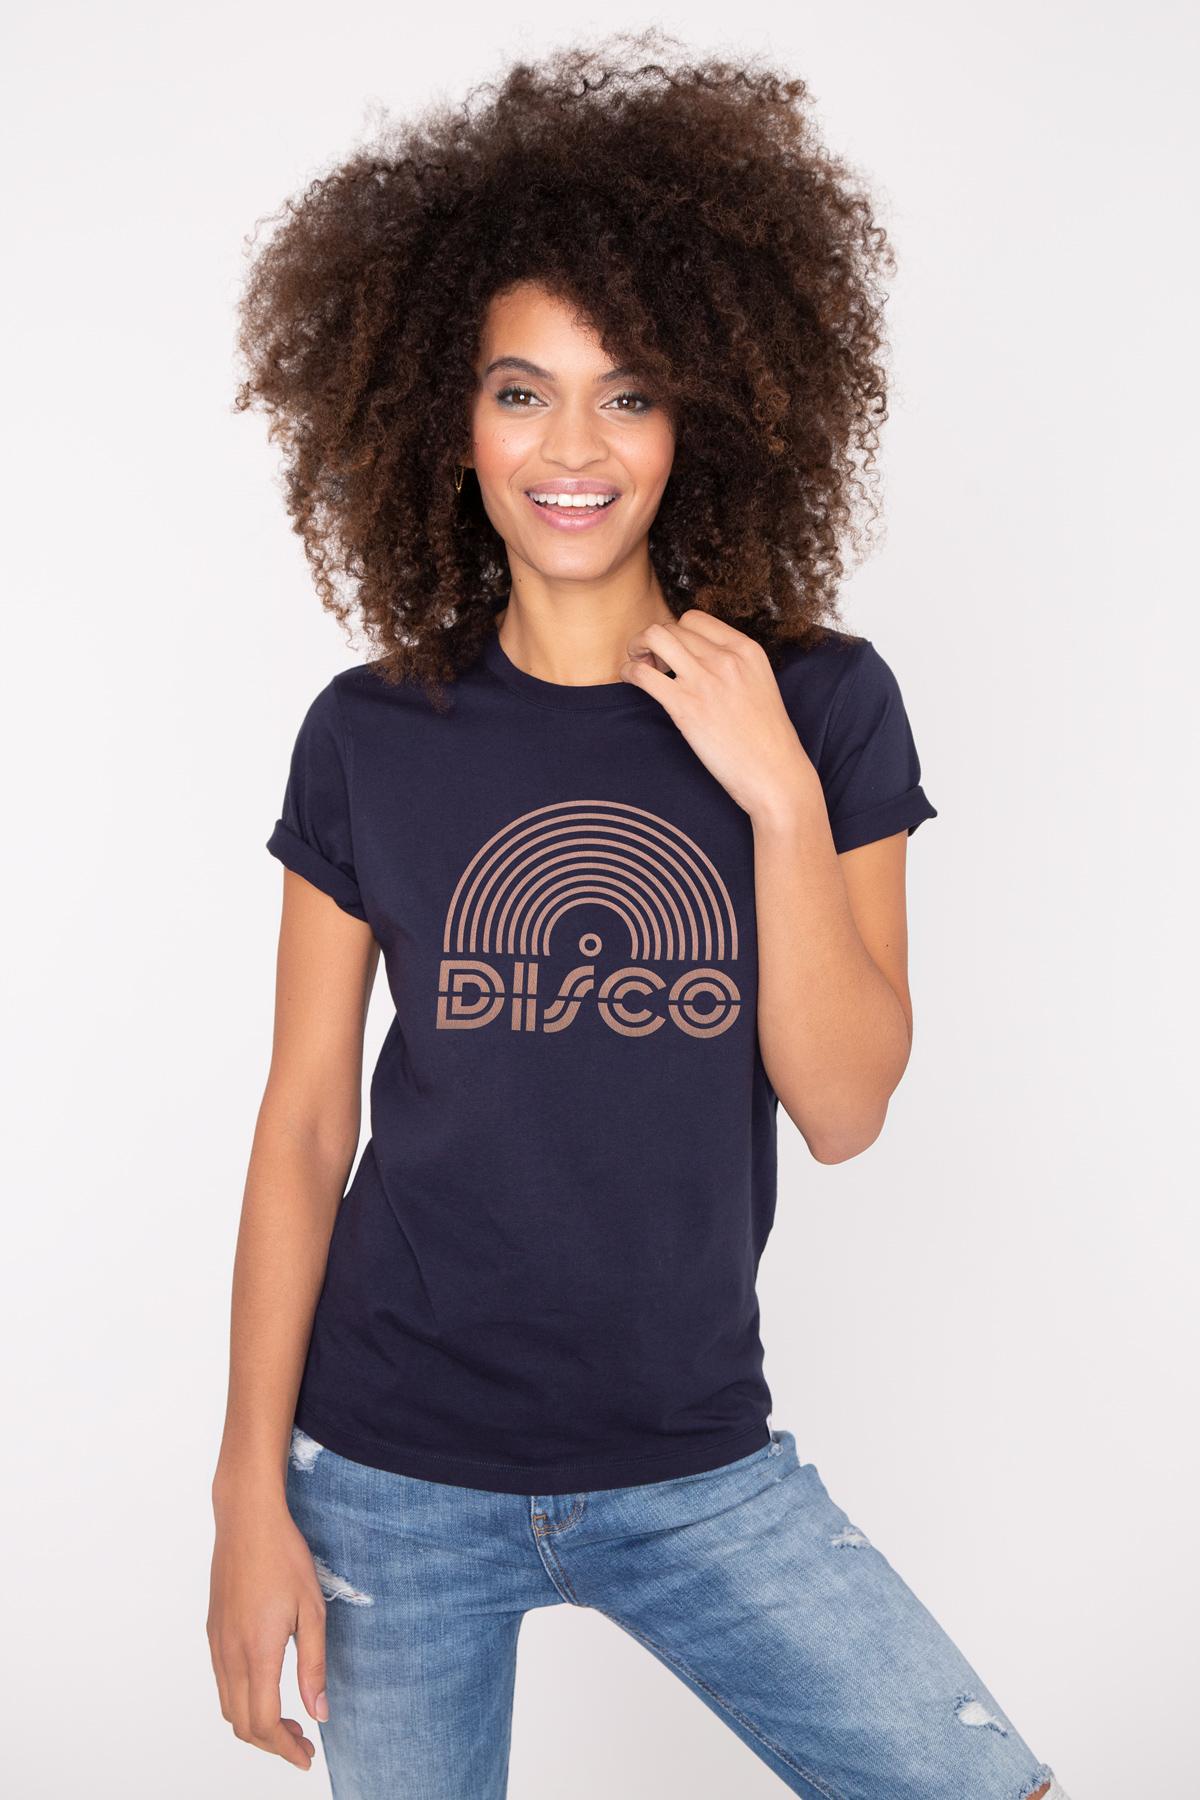 Photo de T-SHIRTS COL ROND Tshirt DISCO chez French Disorder